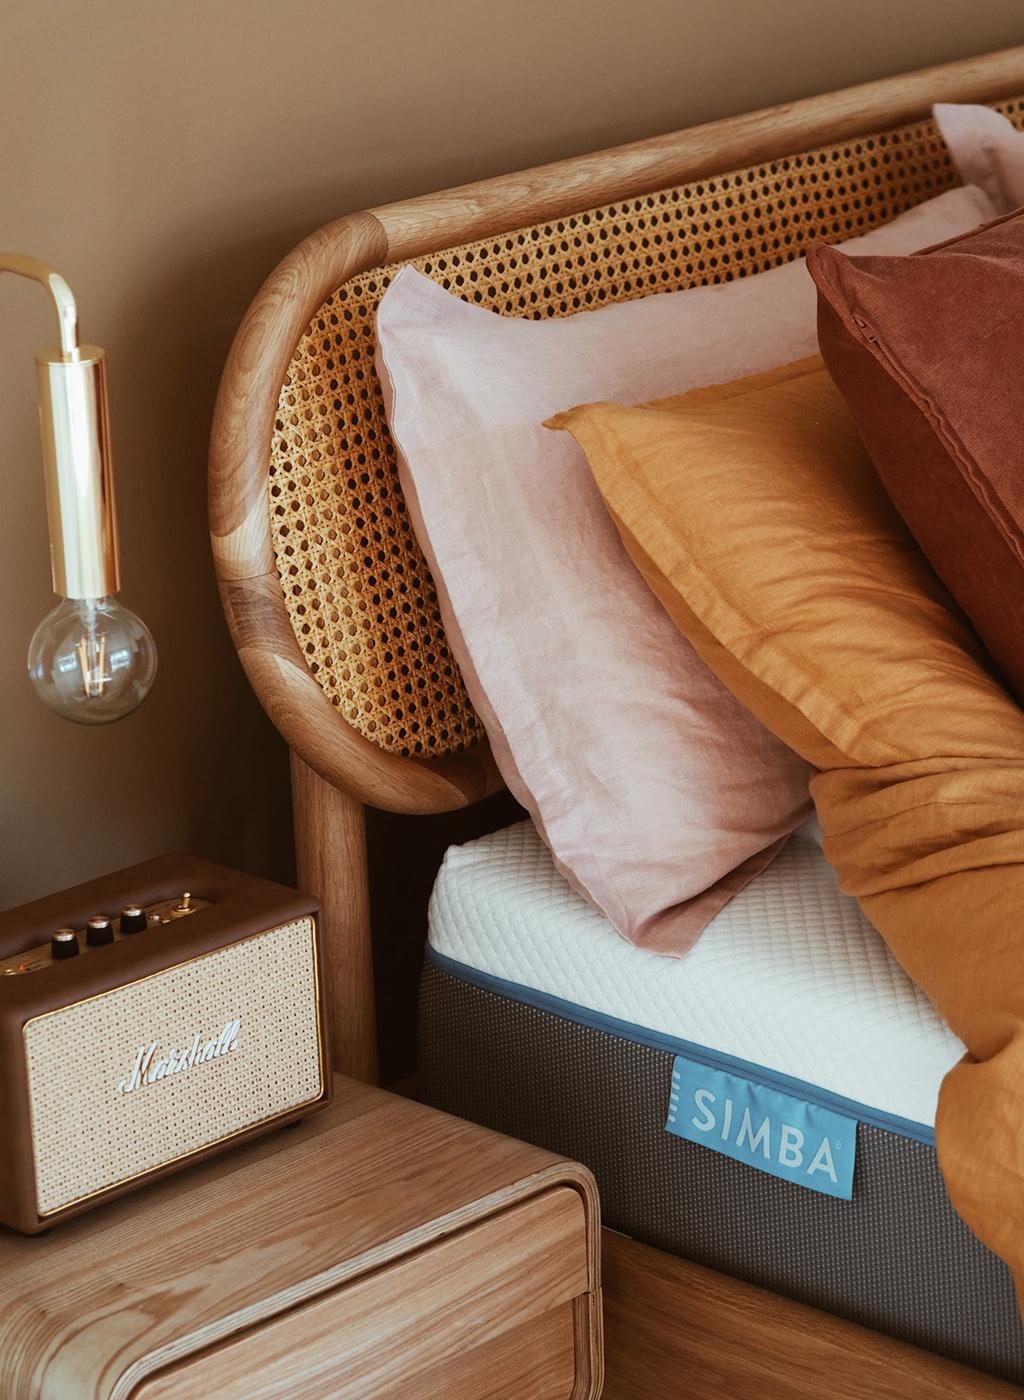 bedroom styling, Simba Sleep, bedroom makeover, renovation, interior styling